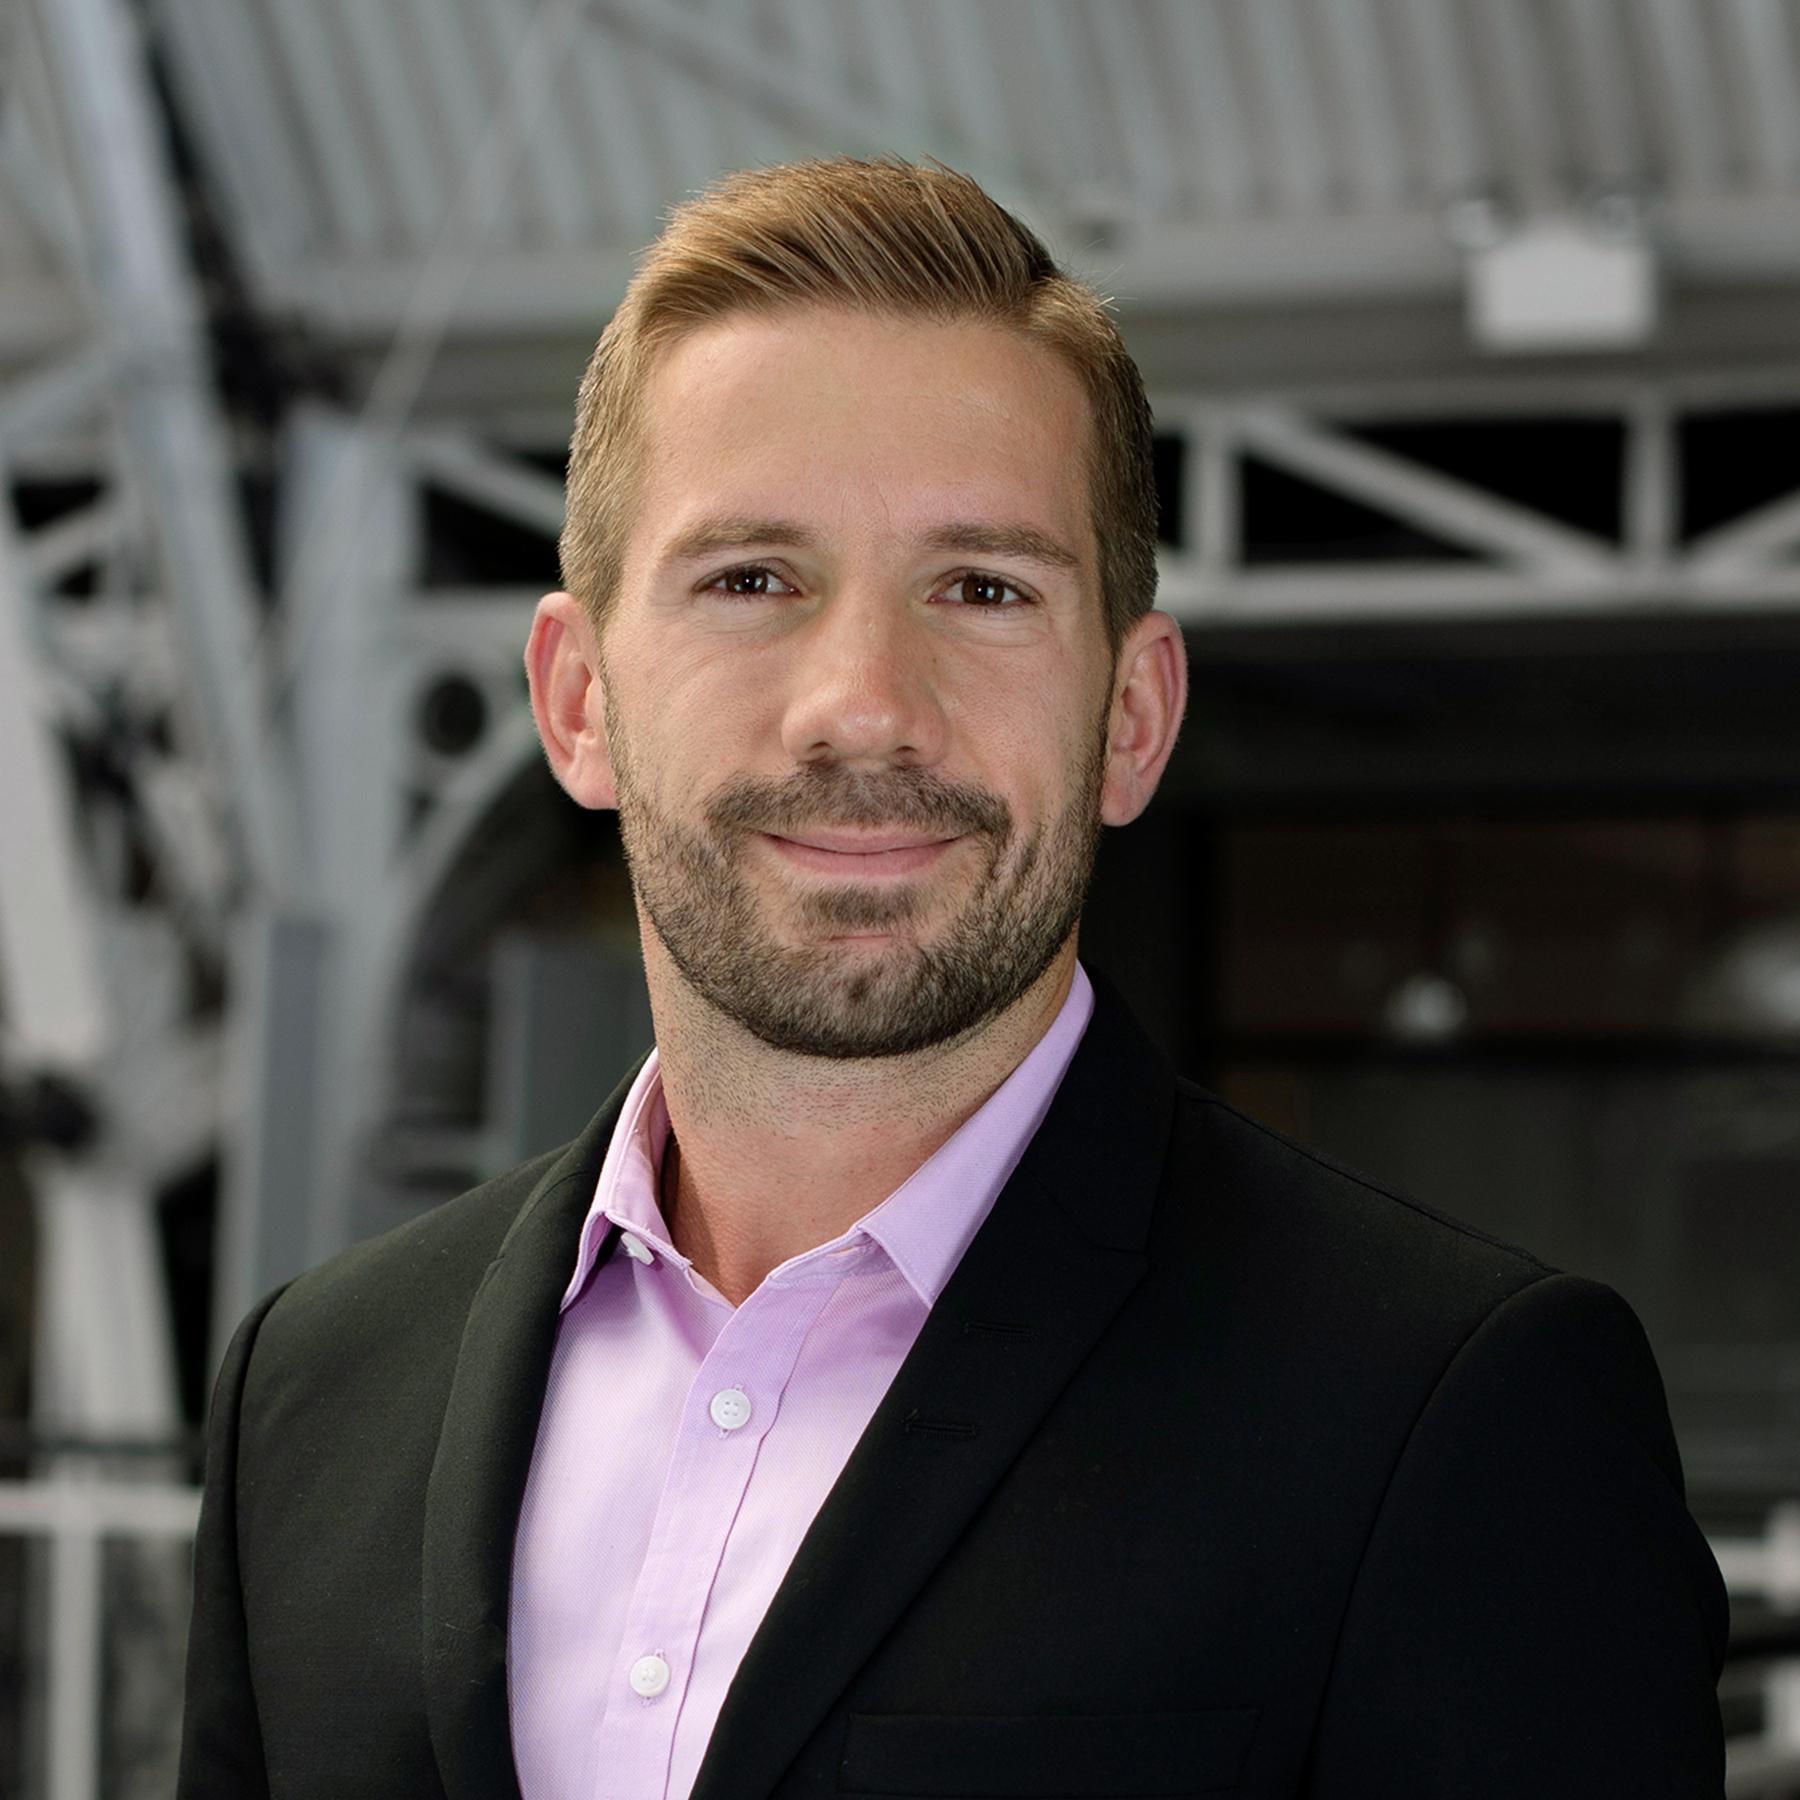 Maximilian Lautenschlager